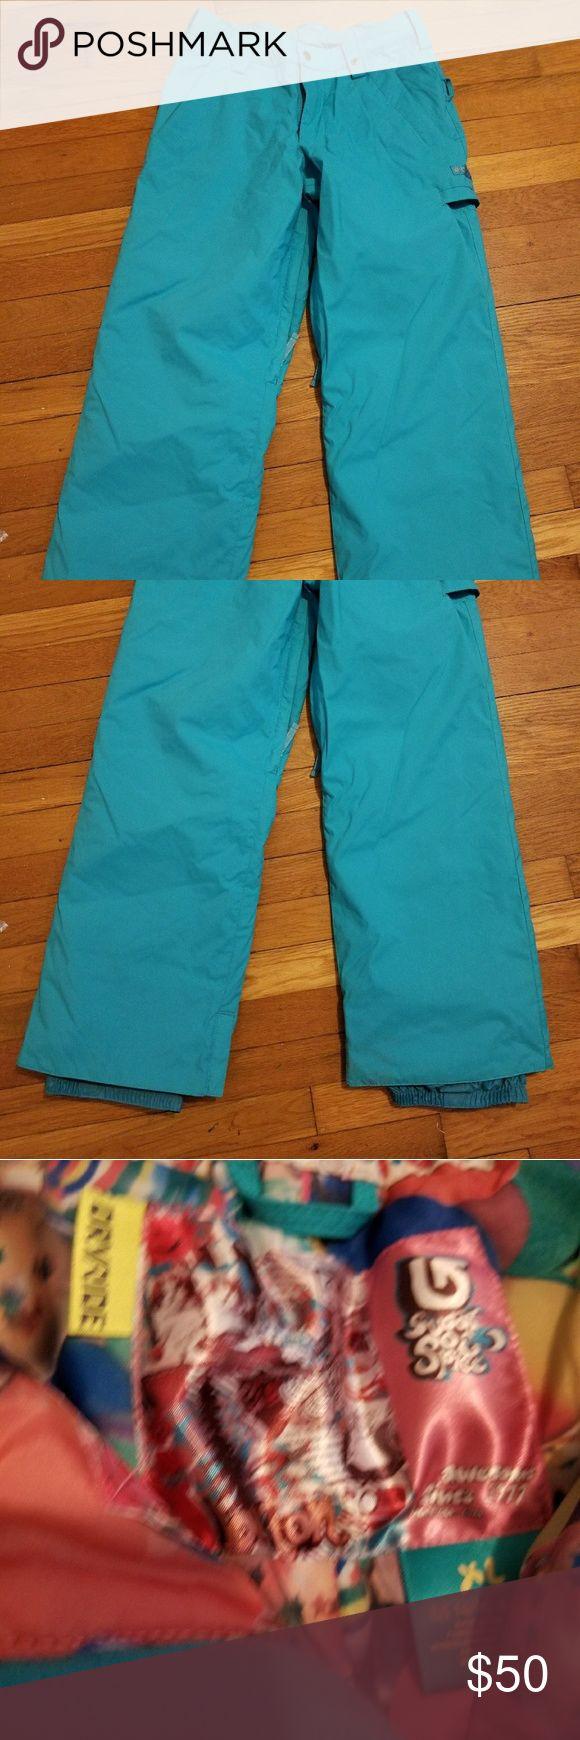 Girls size XL 14/16 Teal Burton Snowboard Pants Excellent NWOT condition girls snowboard pants with liner. Size XL 14/16. Adjustable waste. 37 inches long. Burton Bottoms